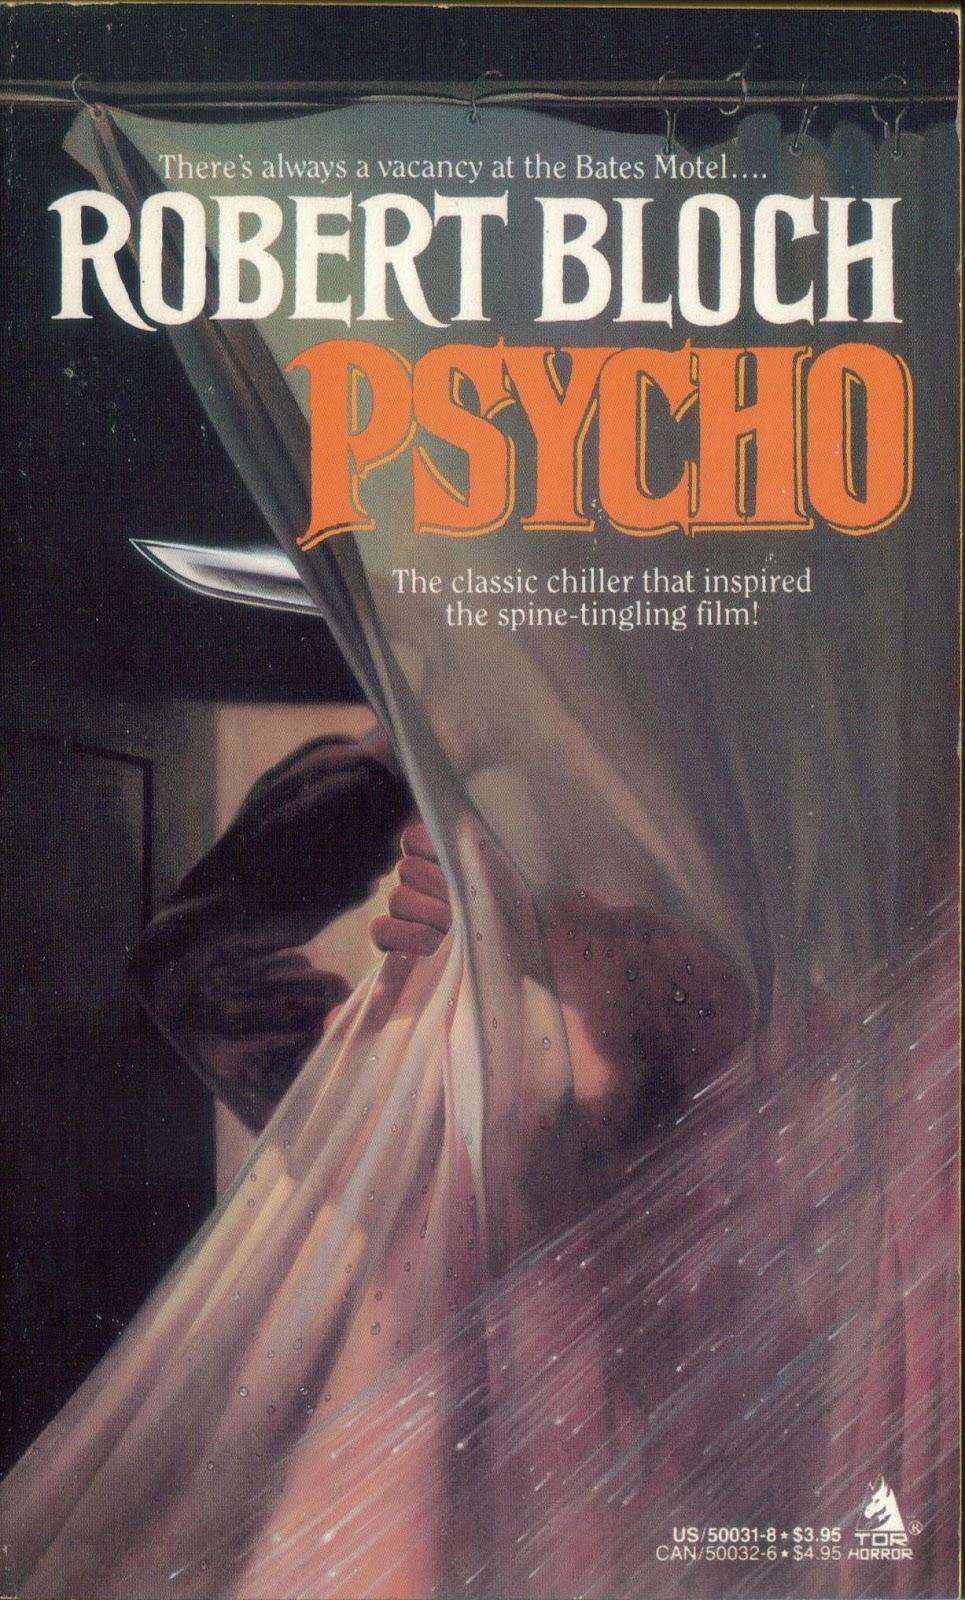 A Full Examination of Robert Bloch's 'Psycho' (Review)